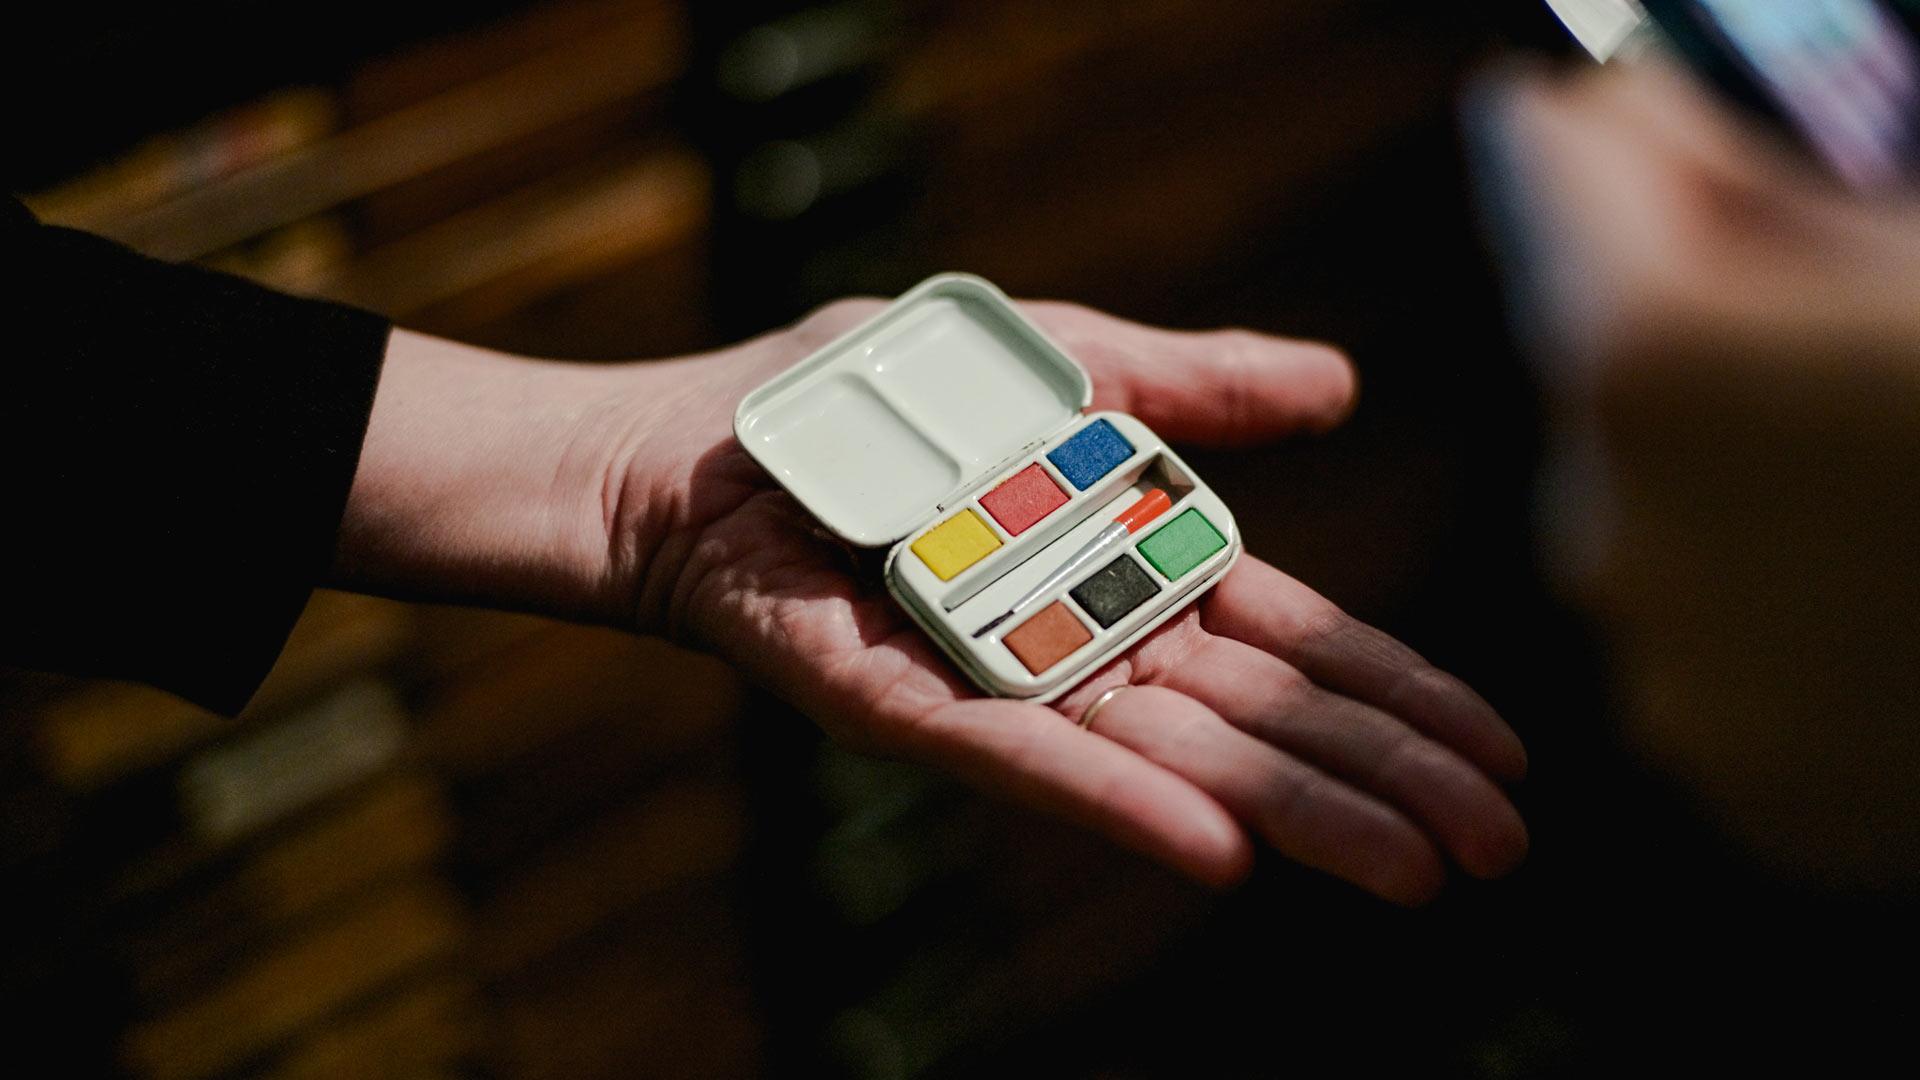 dorothy globus studio miniature water color paint kit